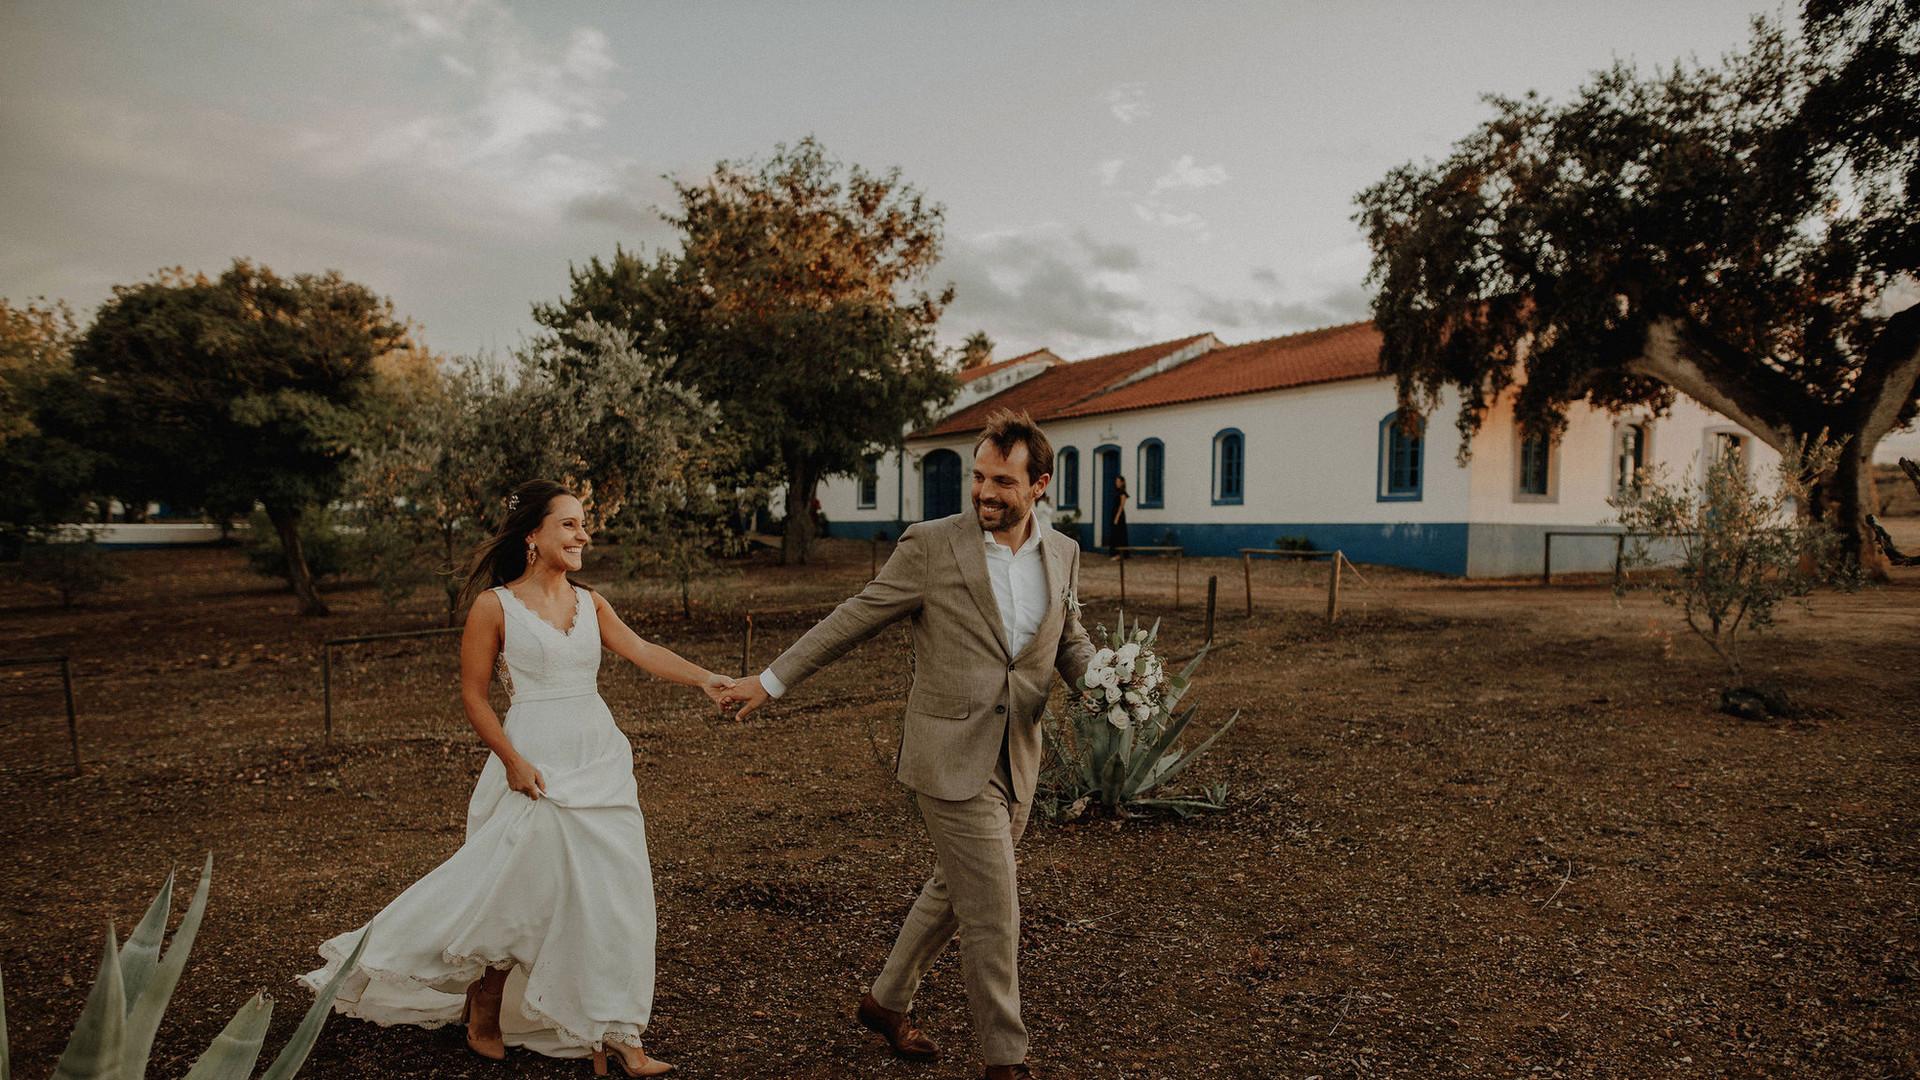 Bride & groom wandering photoshoot